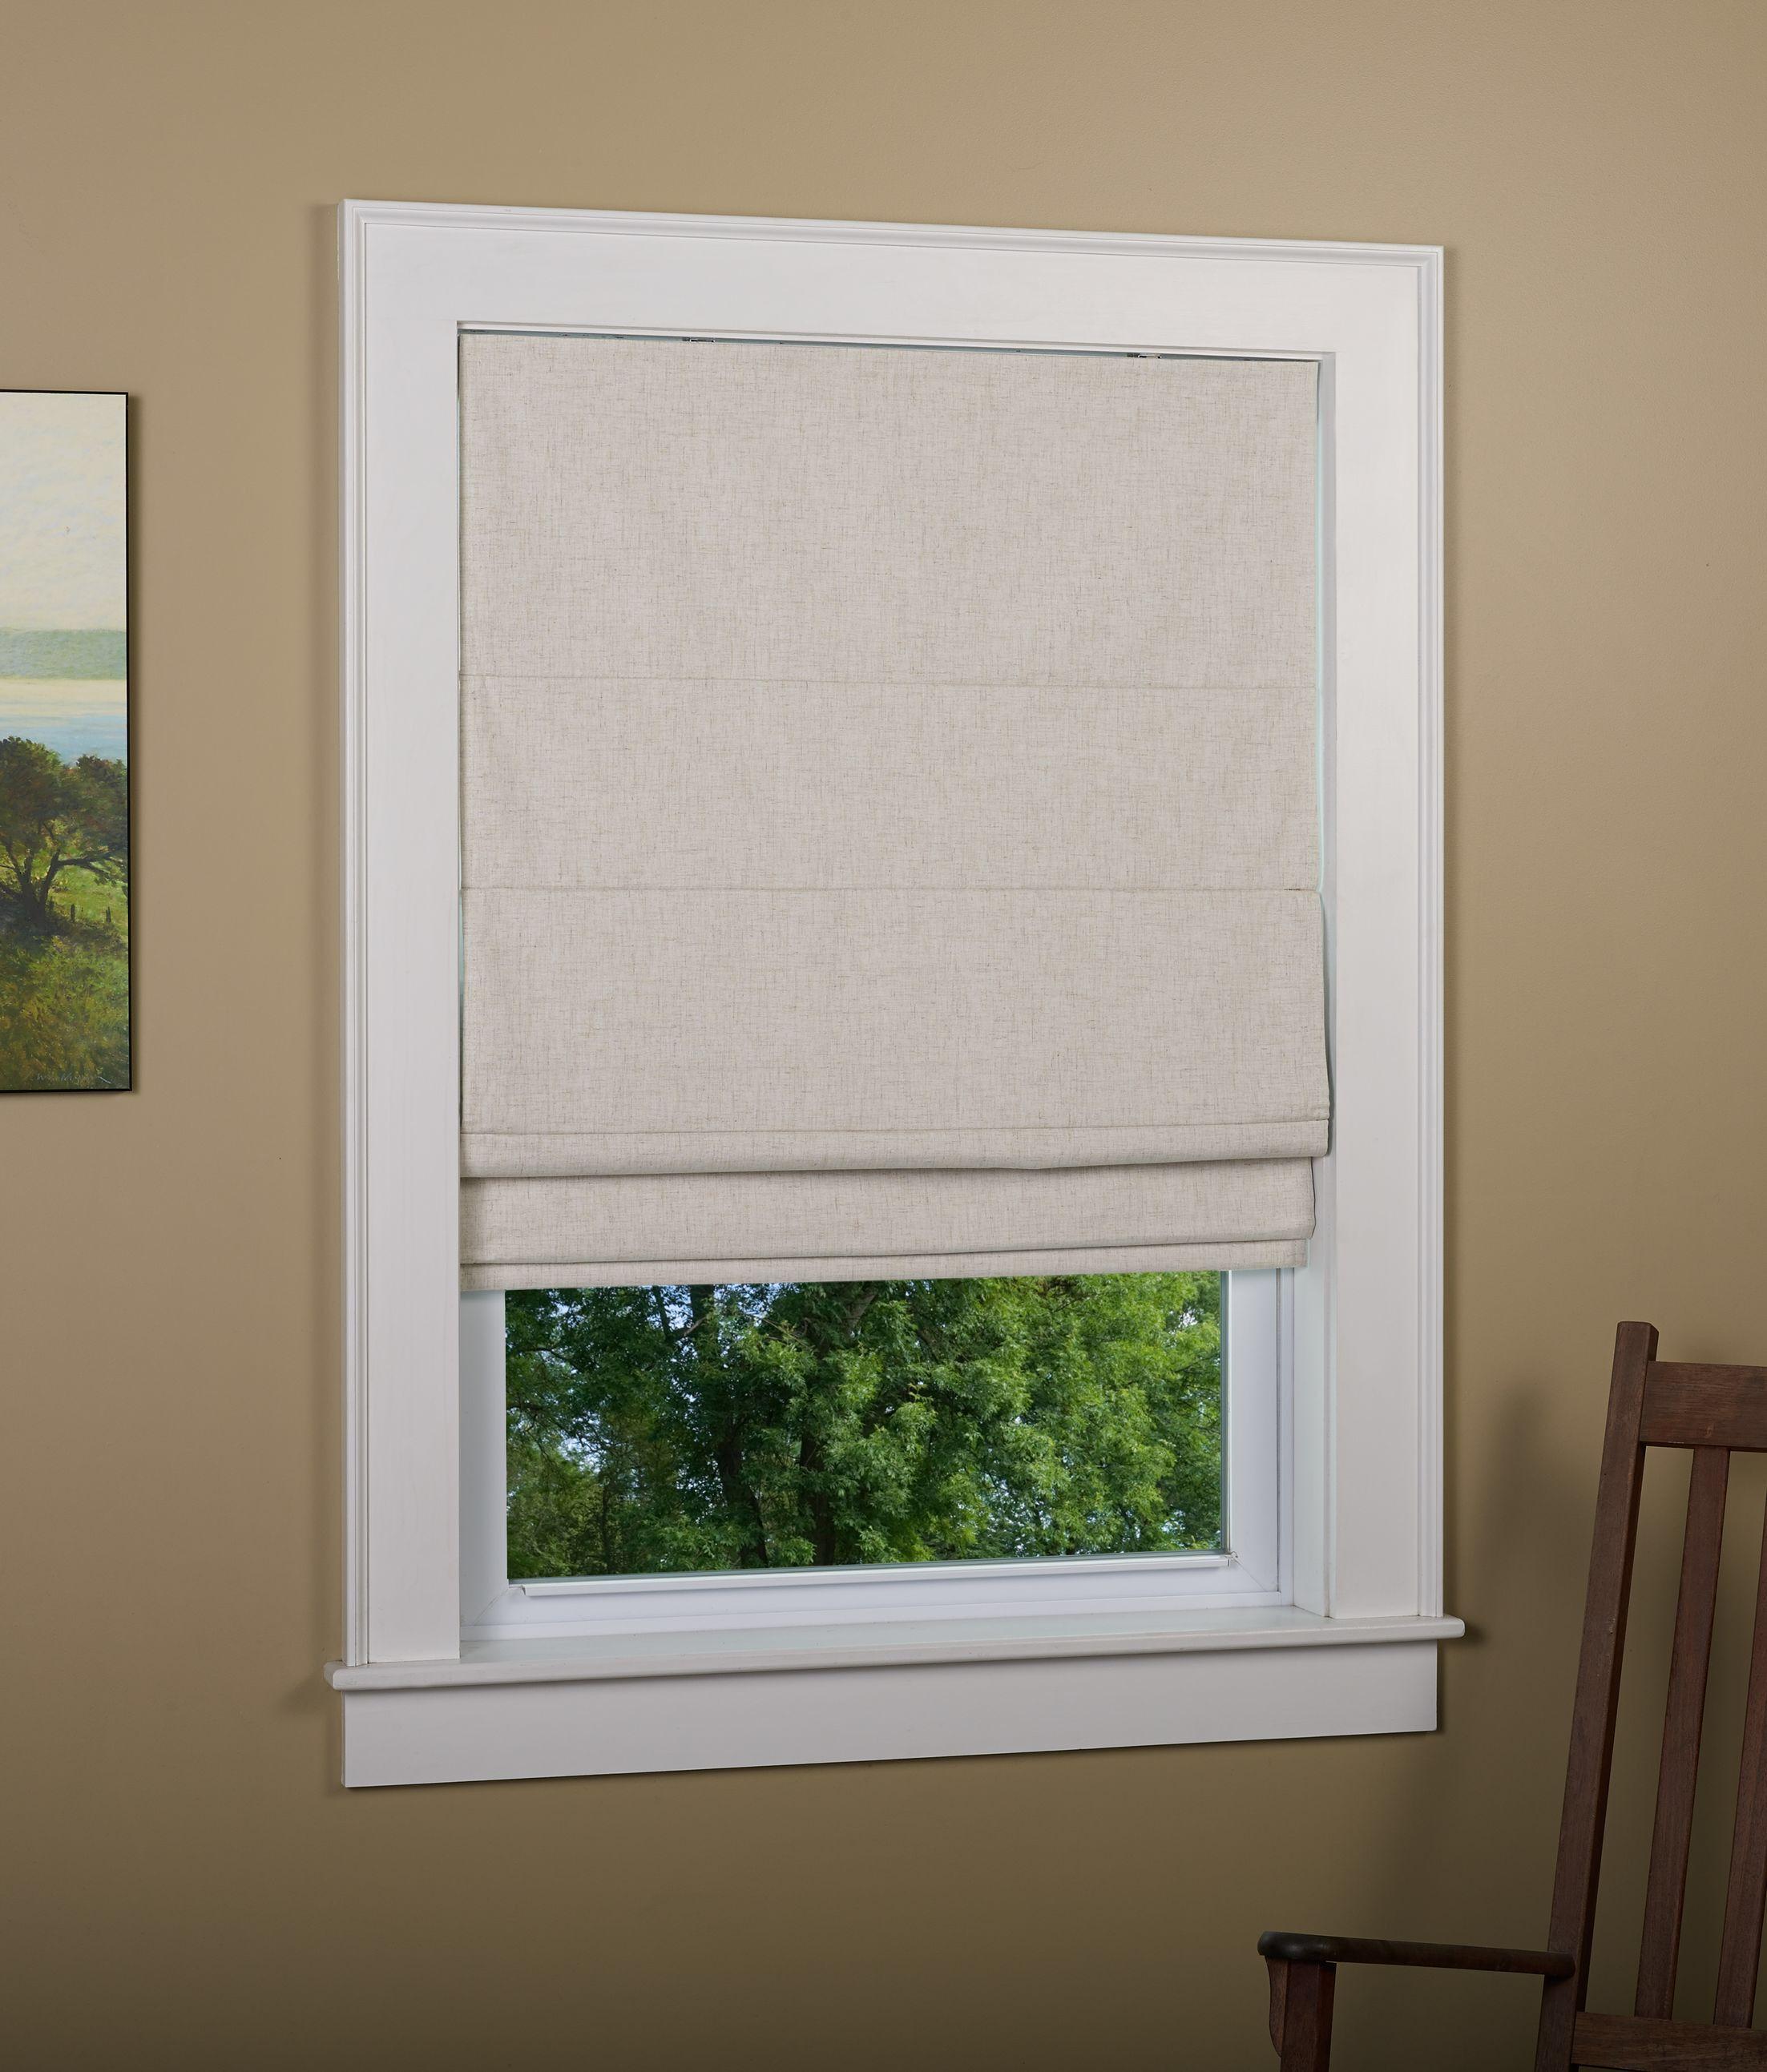 Affordable Custom Bamboo Blinds Bamboo Blinds Living Room Blinds Blinds For Windows